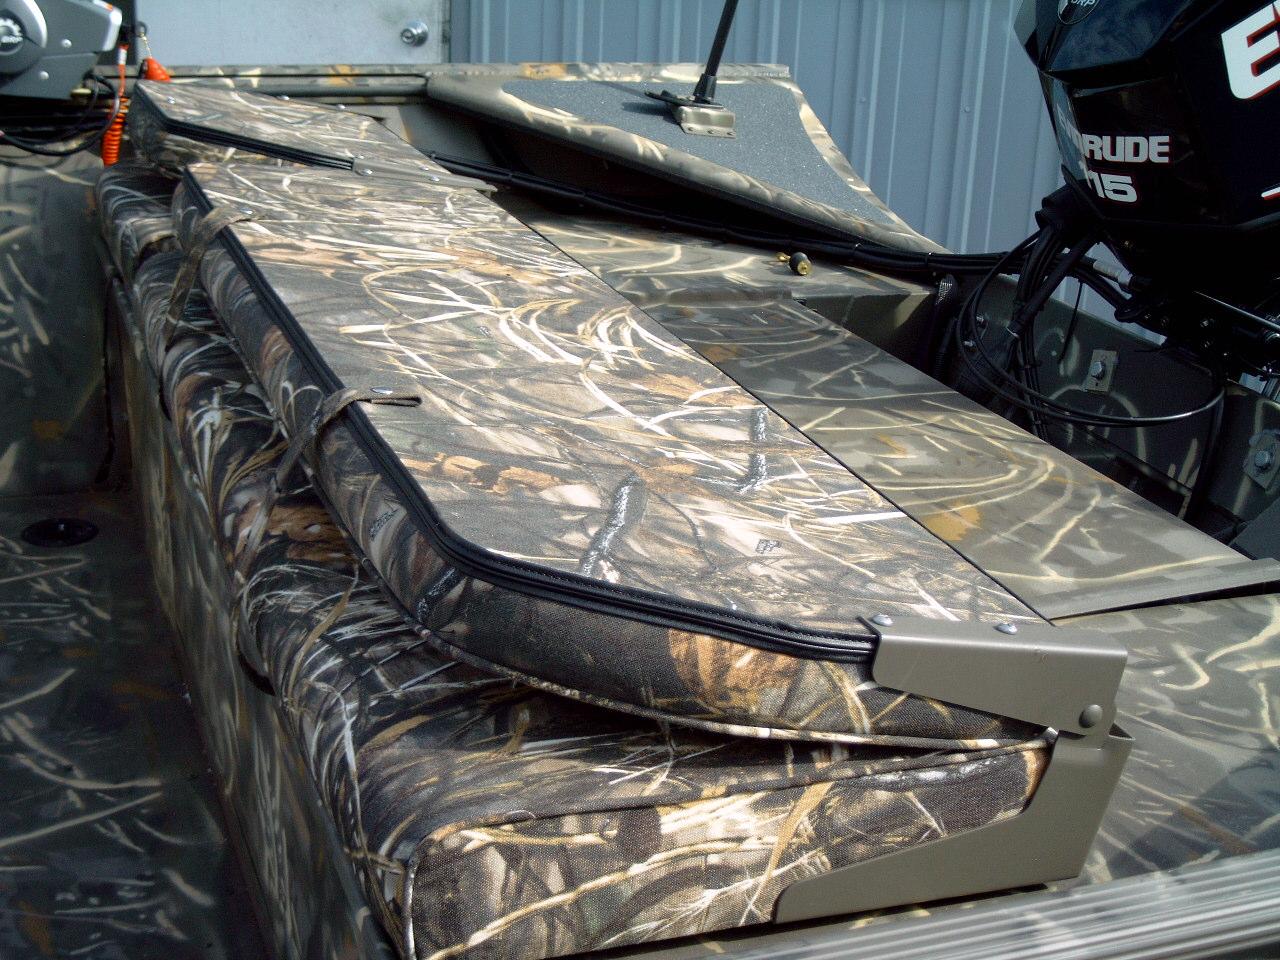 Backwaters Marine War Eagle 2072ldsv Evinrude 115